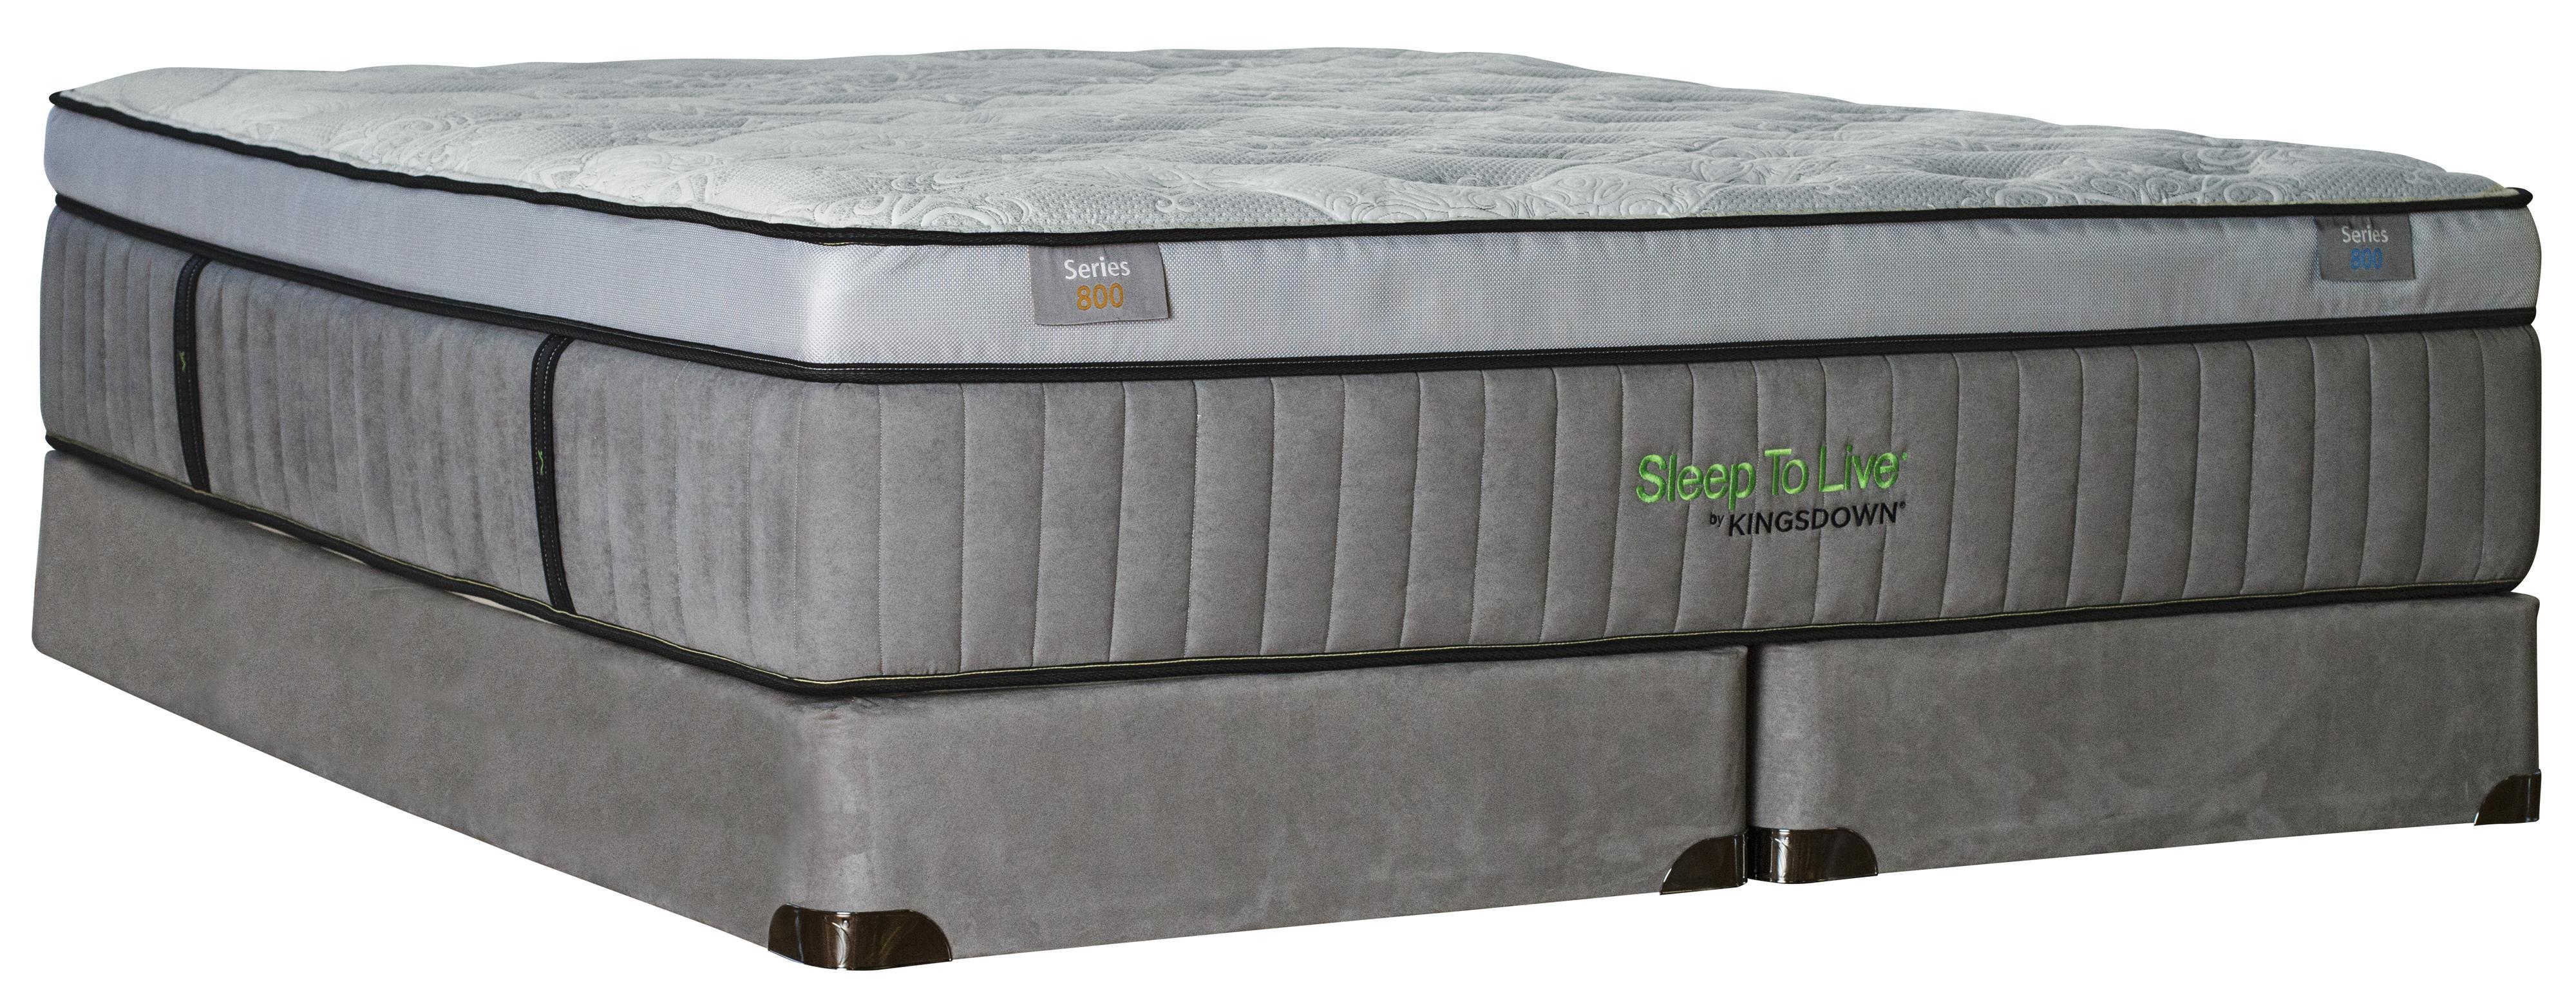 Kingsdown Sleep to Live 800 King Luxurios Box Top Mattress - Item Number: Series800-K